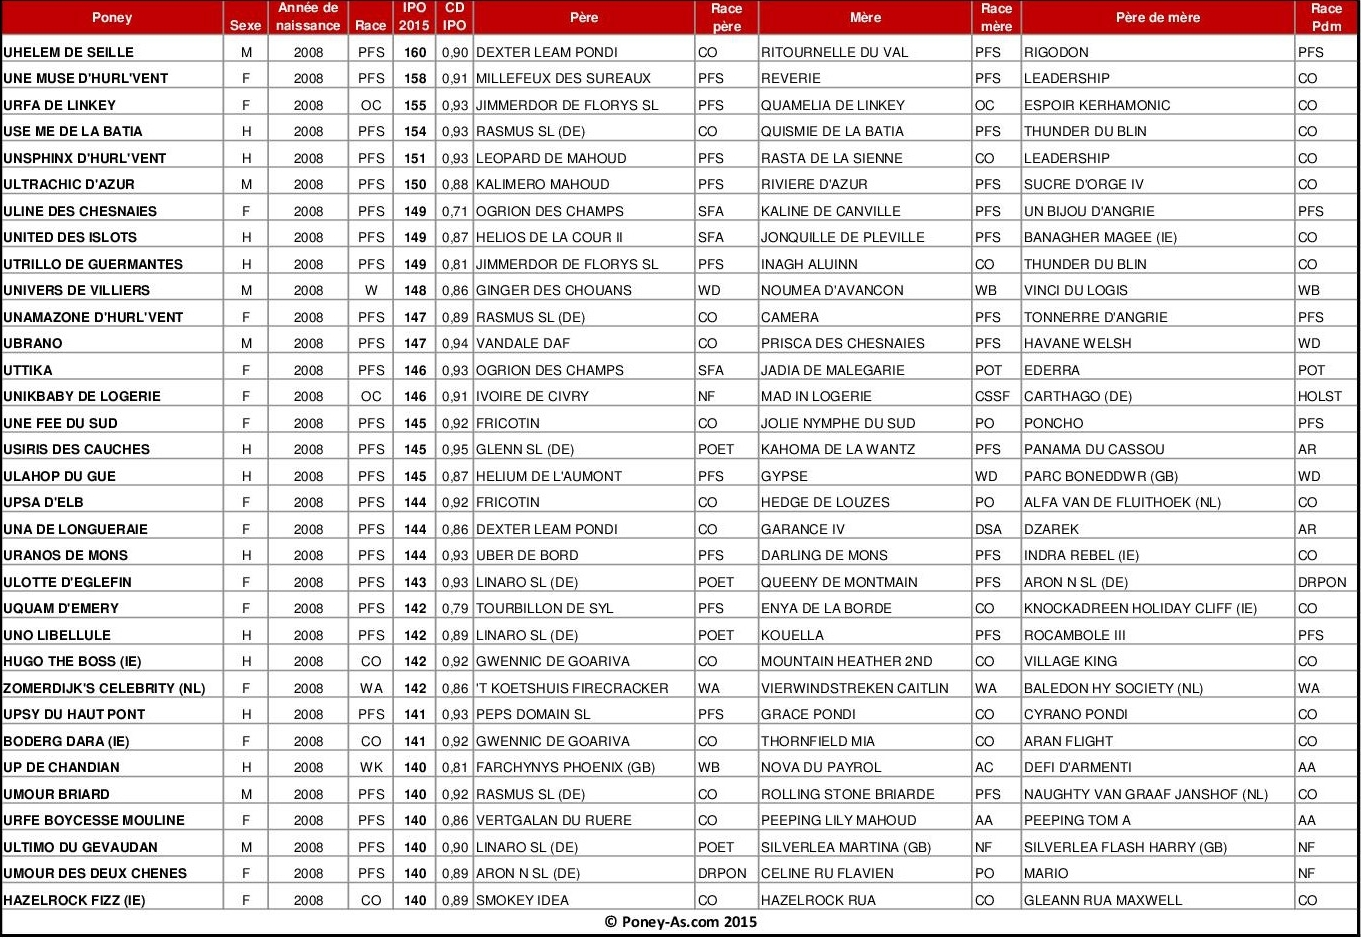 Meilleurs IPO 2015 chez les poneys de 7 ans - Poney-As.com